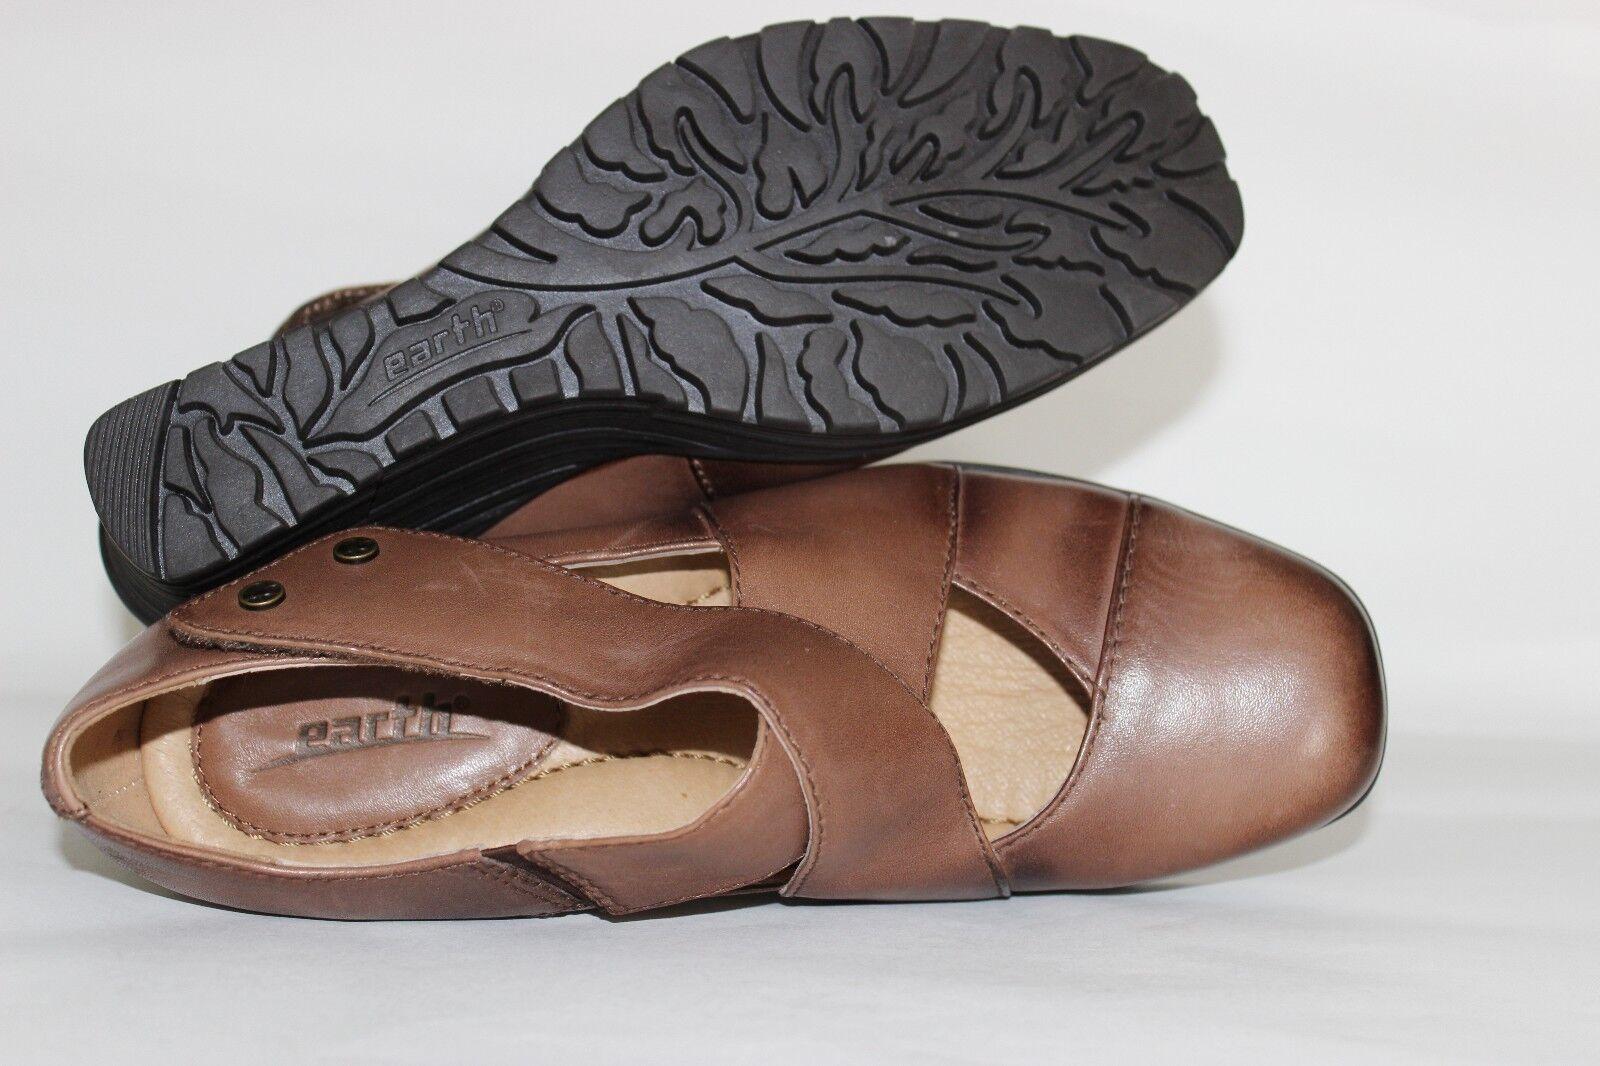 EARTH Spindrift Cinnamon Premium Premium Premium Leather 2.5  Wedge Mary Janes 6 B NEW L@@K 31 55e880